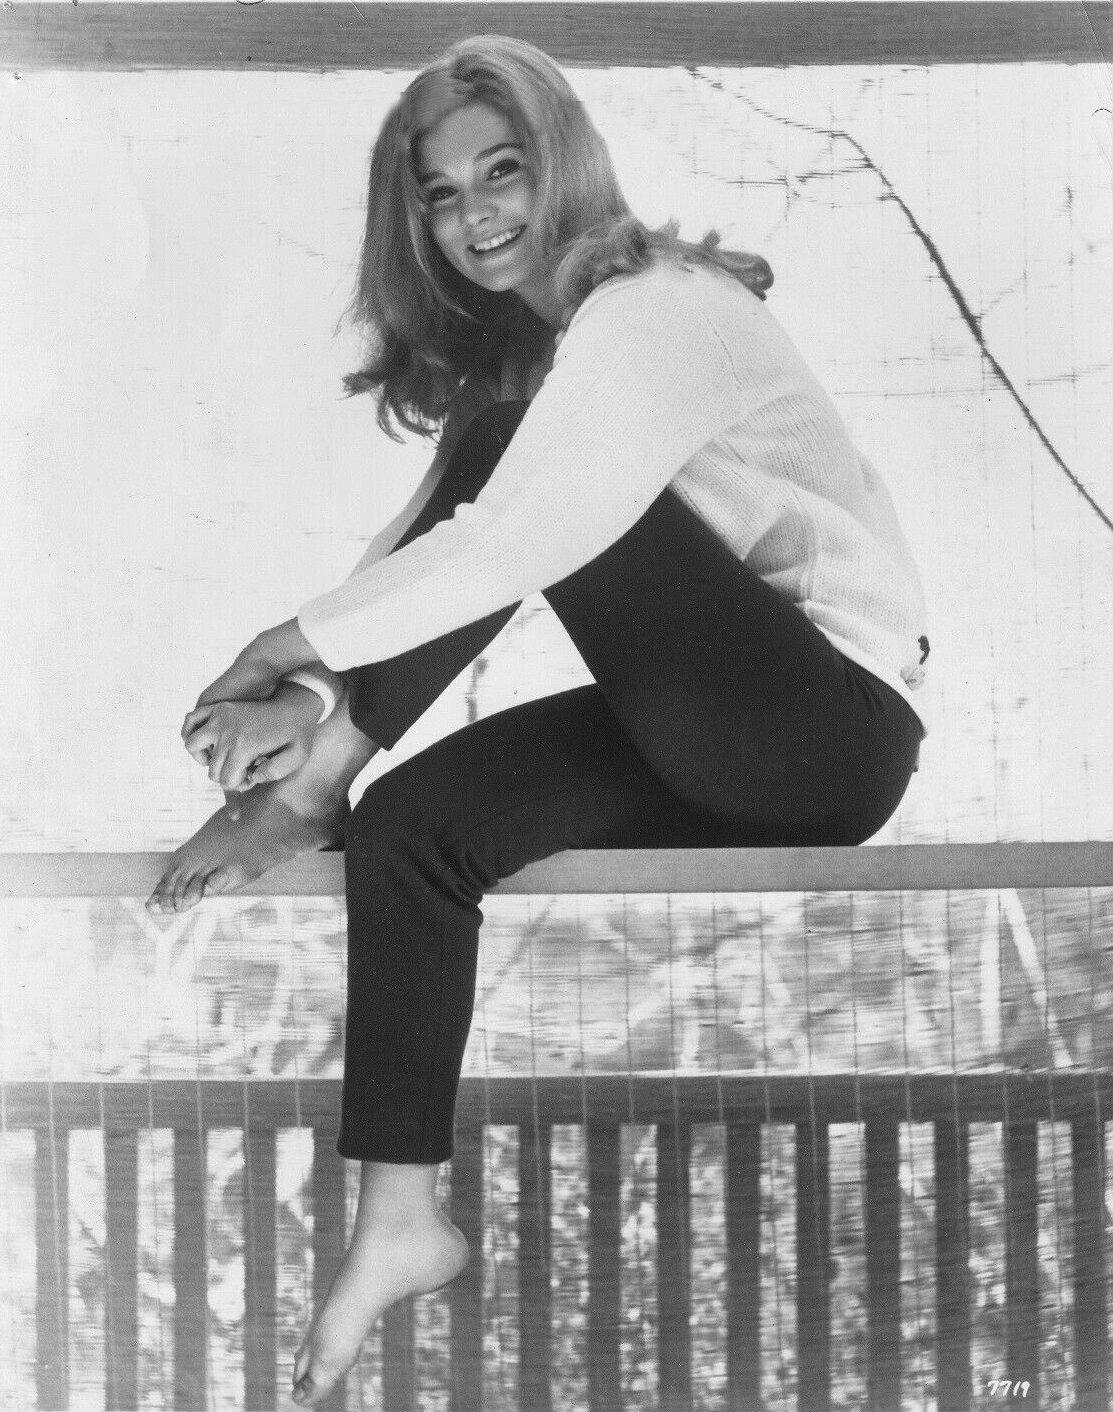 https://pics.wikifeet.com/Yvette-Mimieux-Feet-4051435.jpg